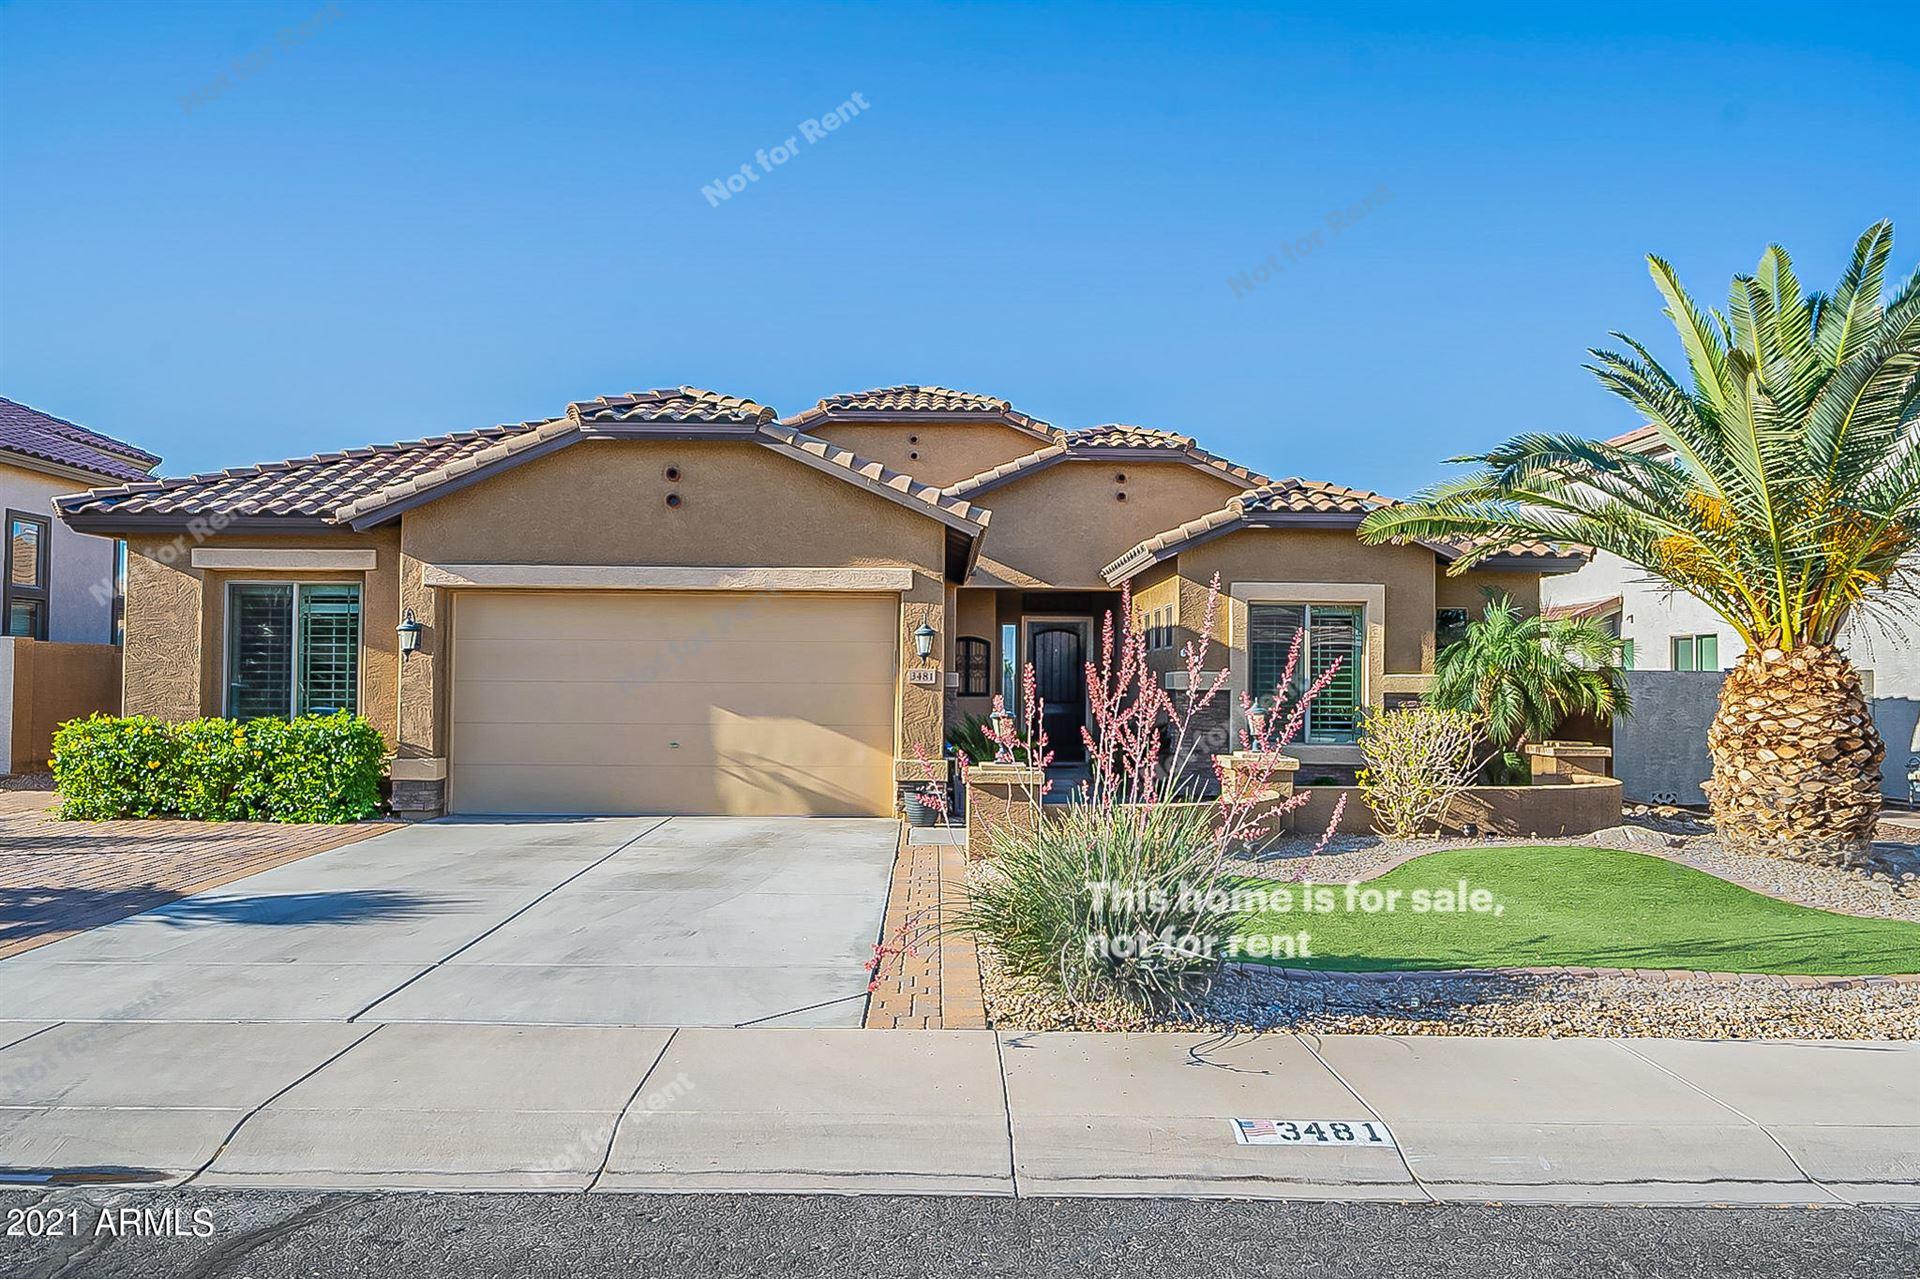 3481 E ISAIAH Avenue, Gilbert, AZ 85298 - MLS#: 6232547